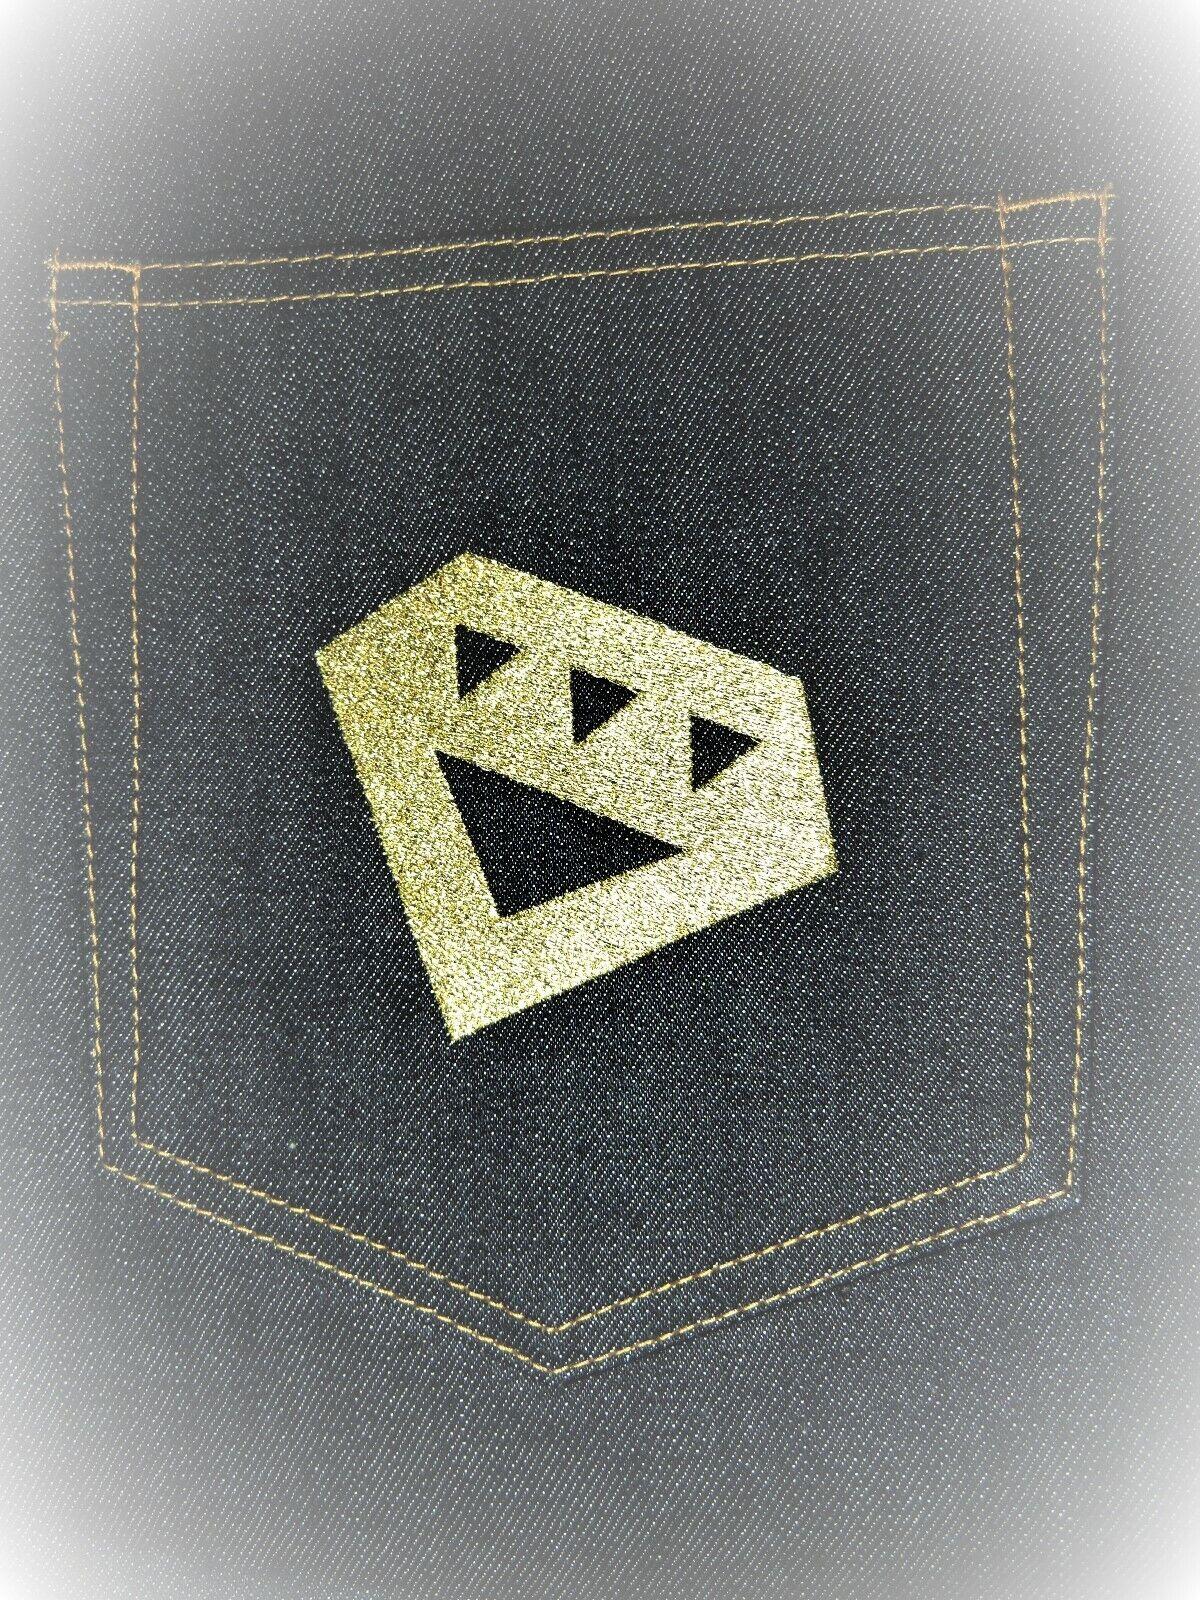 Billionaire Boys Club DIAMOND & DOLLAR denim shorts 2XL  BbcIceCream XXL  D&D